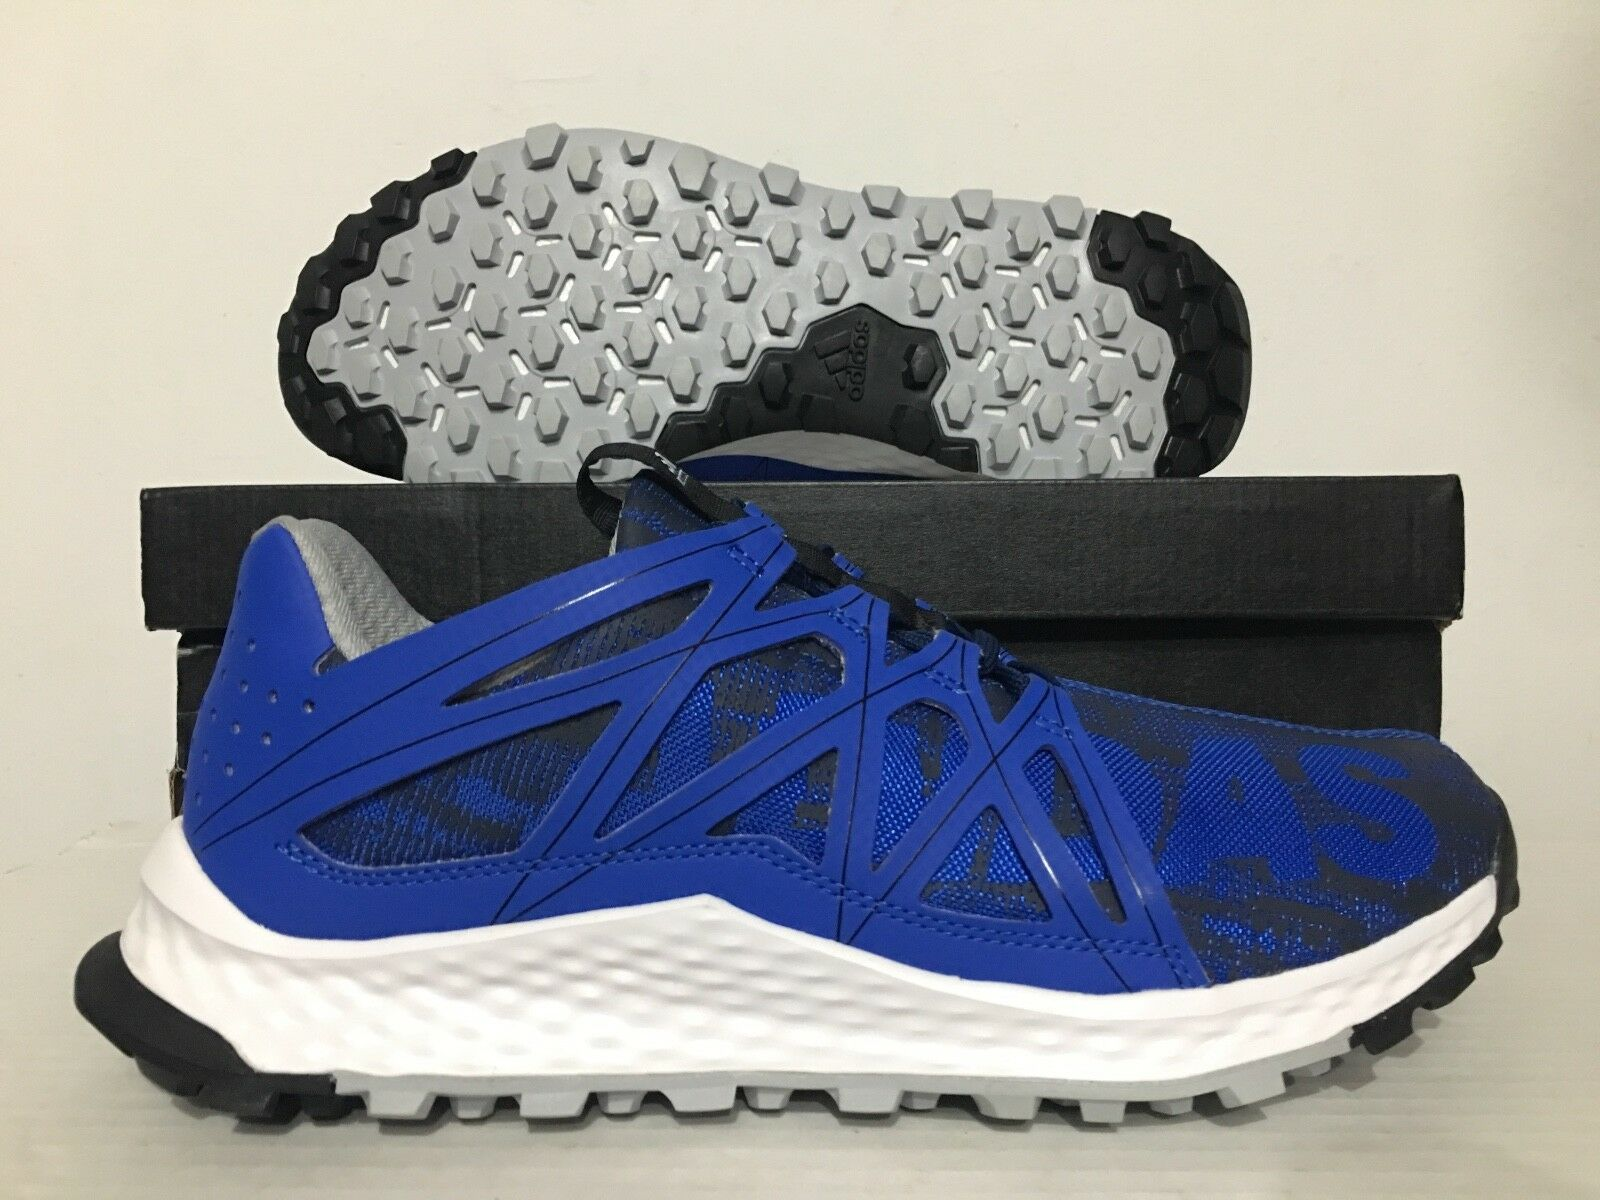 timeless design f0ea1 78302 ... Adidas Vigor Bounce M Chaussures Course Randonnée Randonnée Randonnée  Bleu  B42765  Noir  BW0399 ...